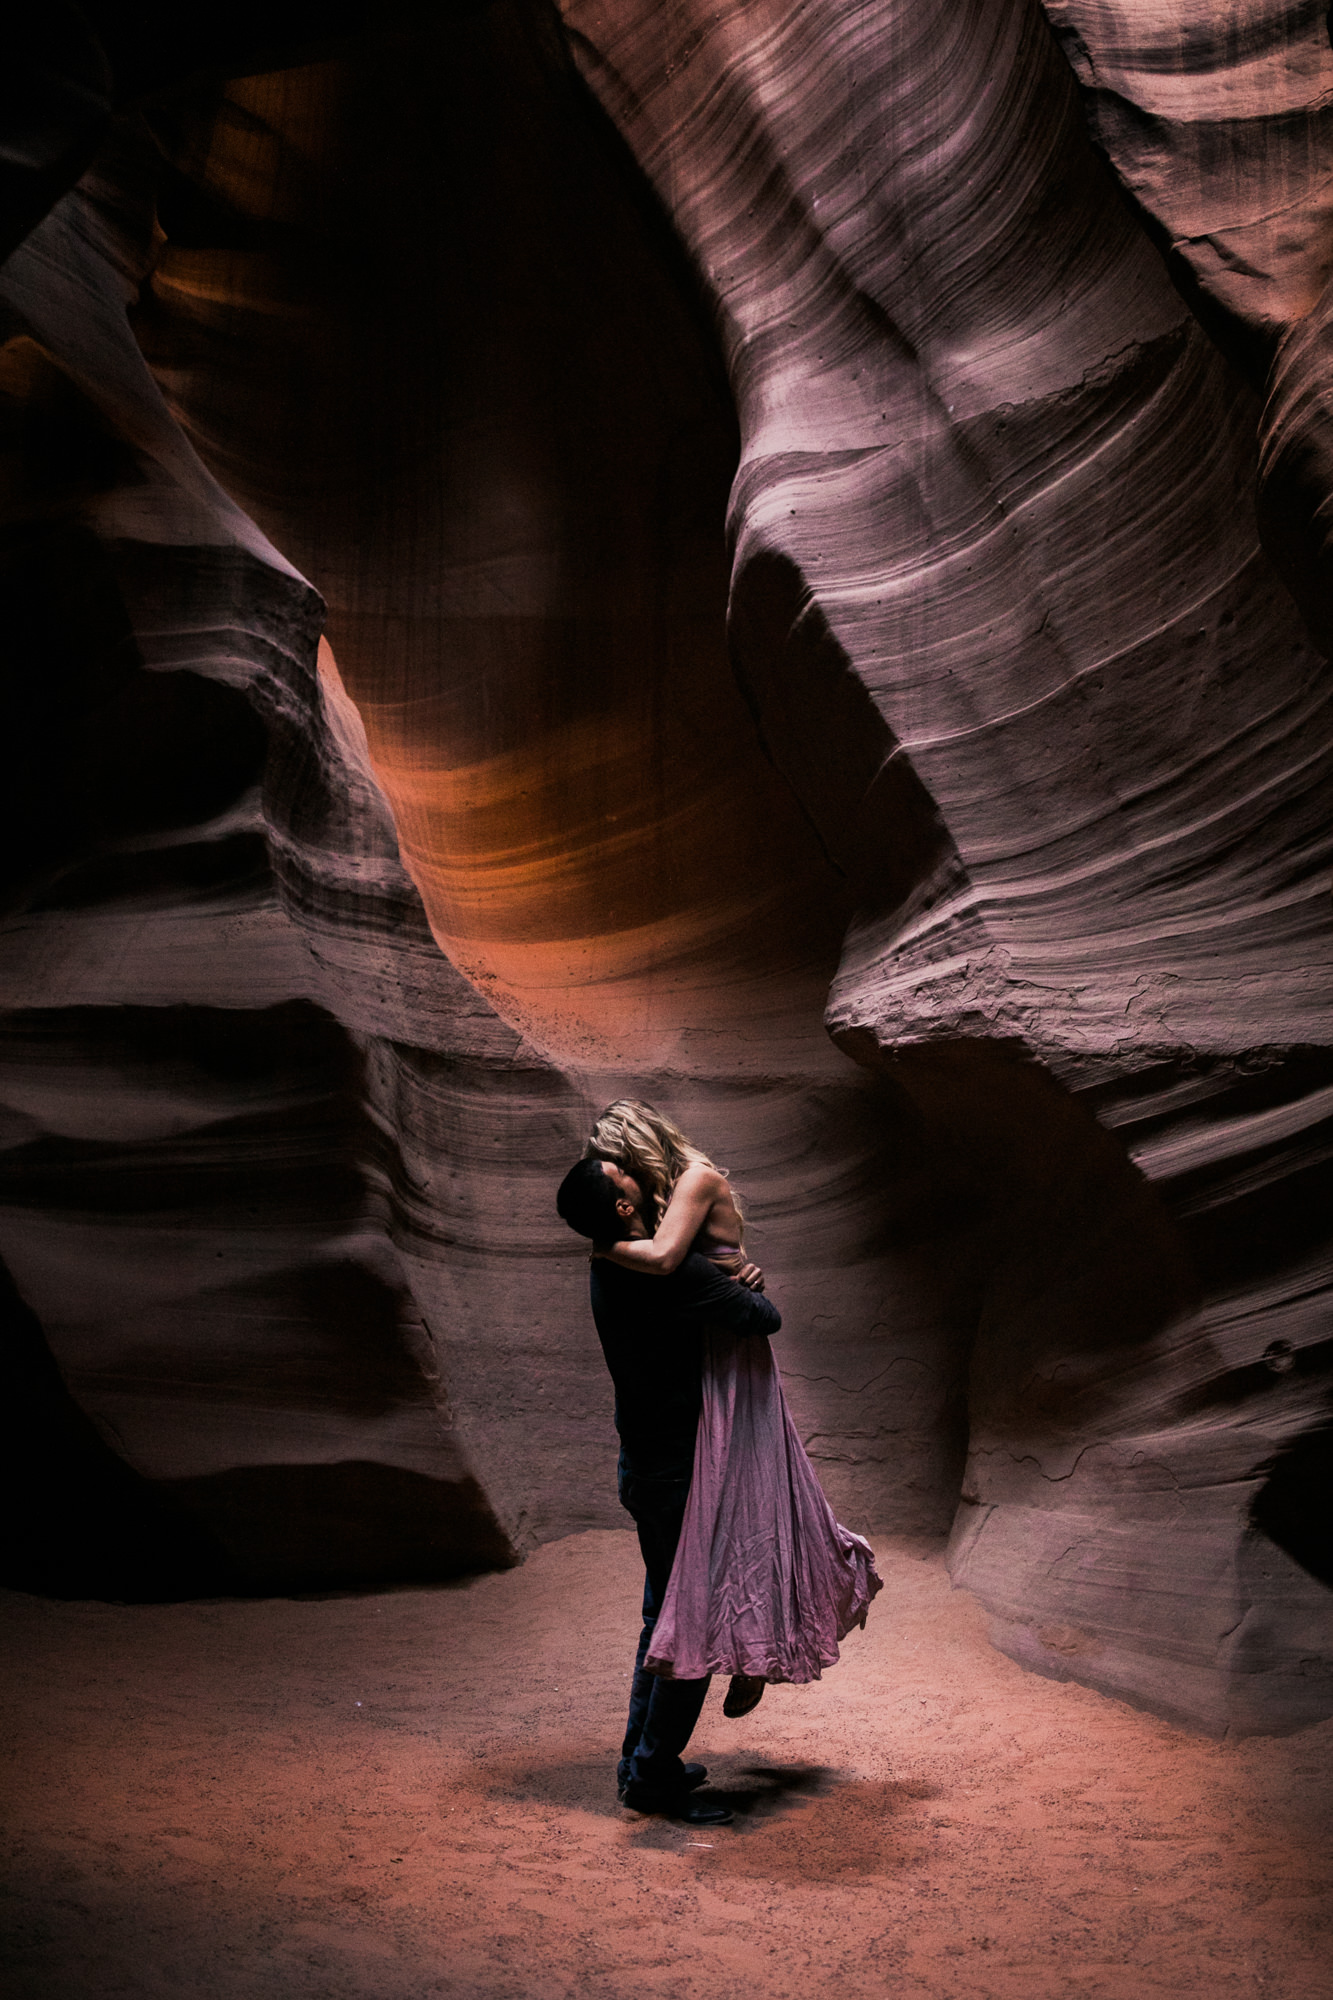 antelope canyon adventure elopement session | destination engagement photo inspiration | utah adventure elopement photographers | the hearnes adventure photography | www.thehearnes.com